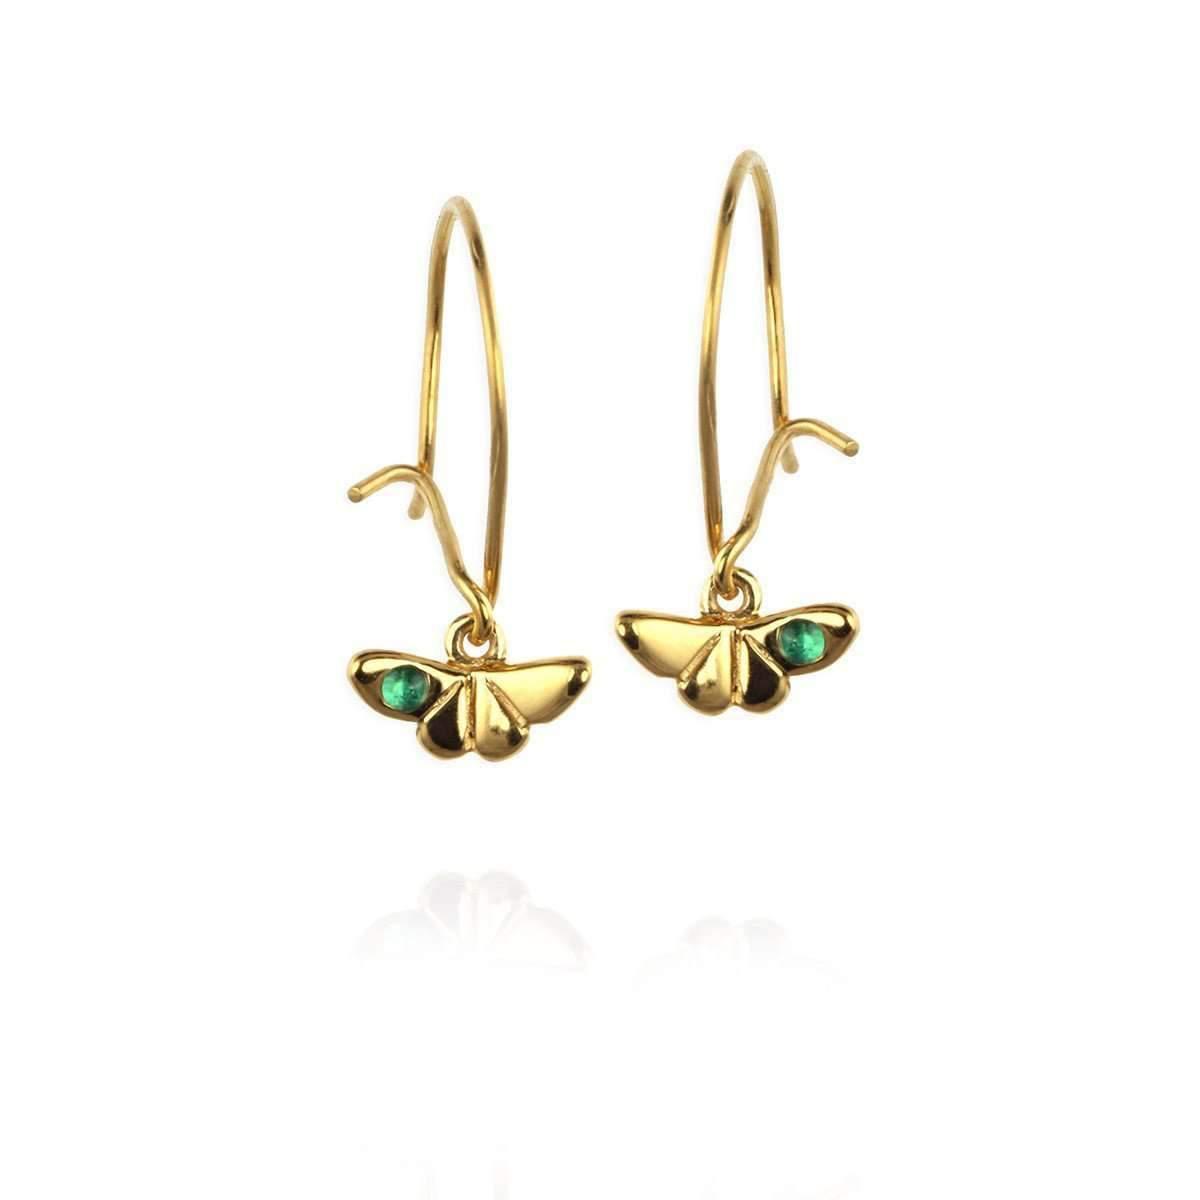 Jana Reinhardt Gold Plated Silver Tiny Sparrow Hook Earrings DcY72